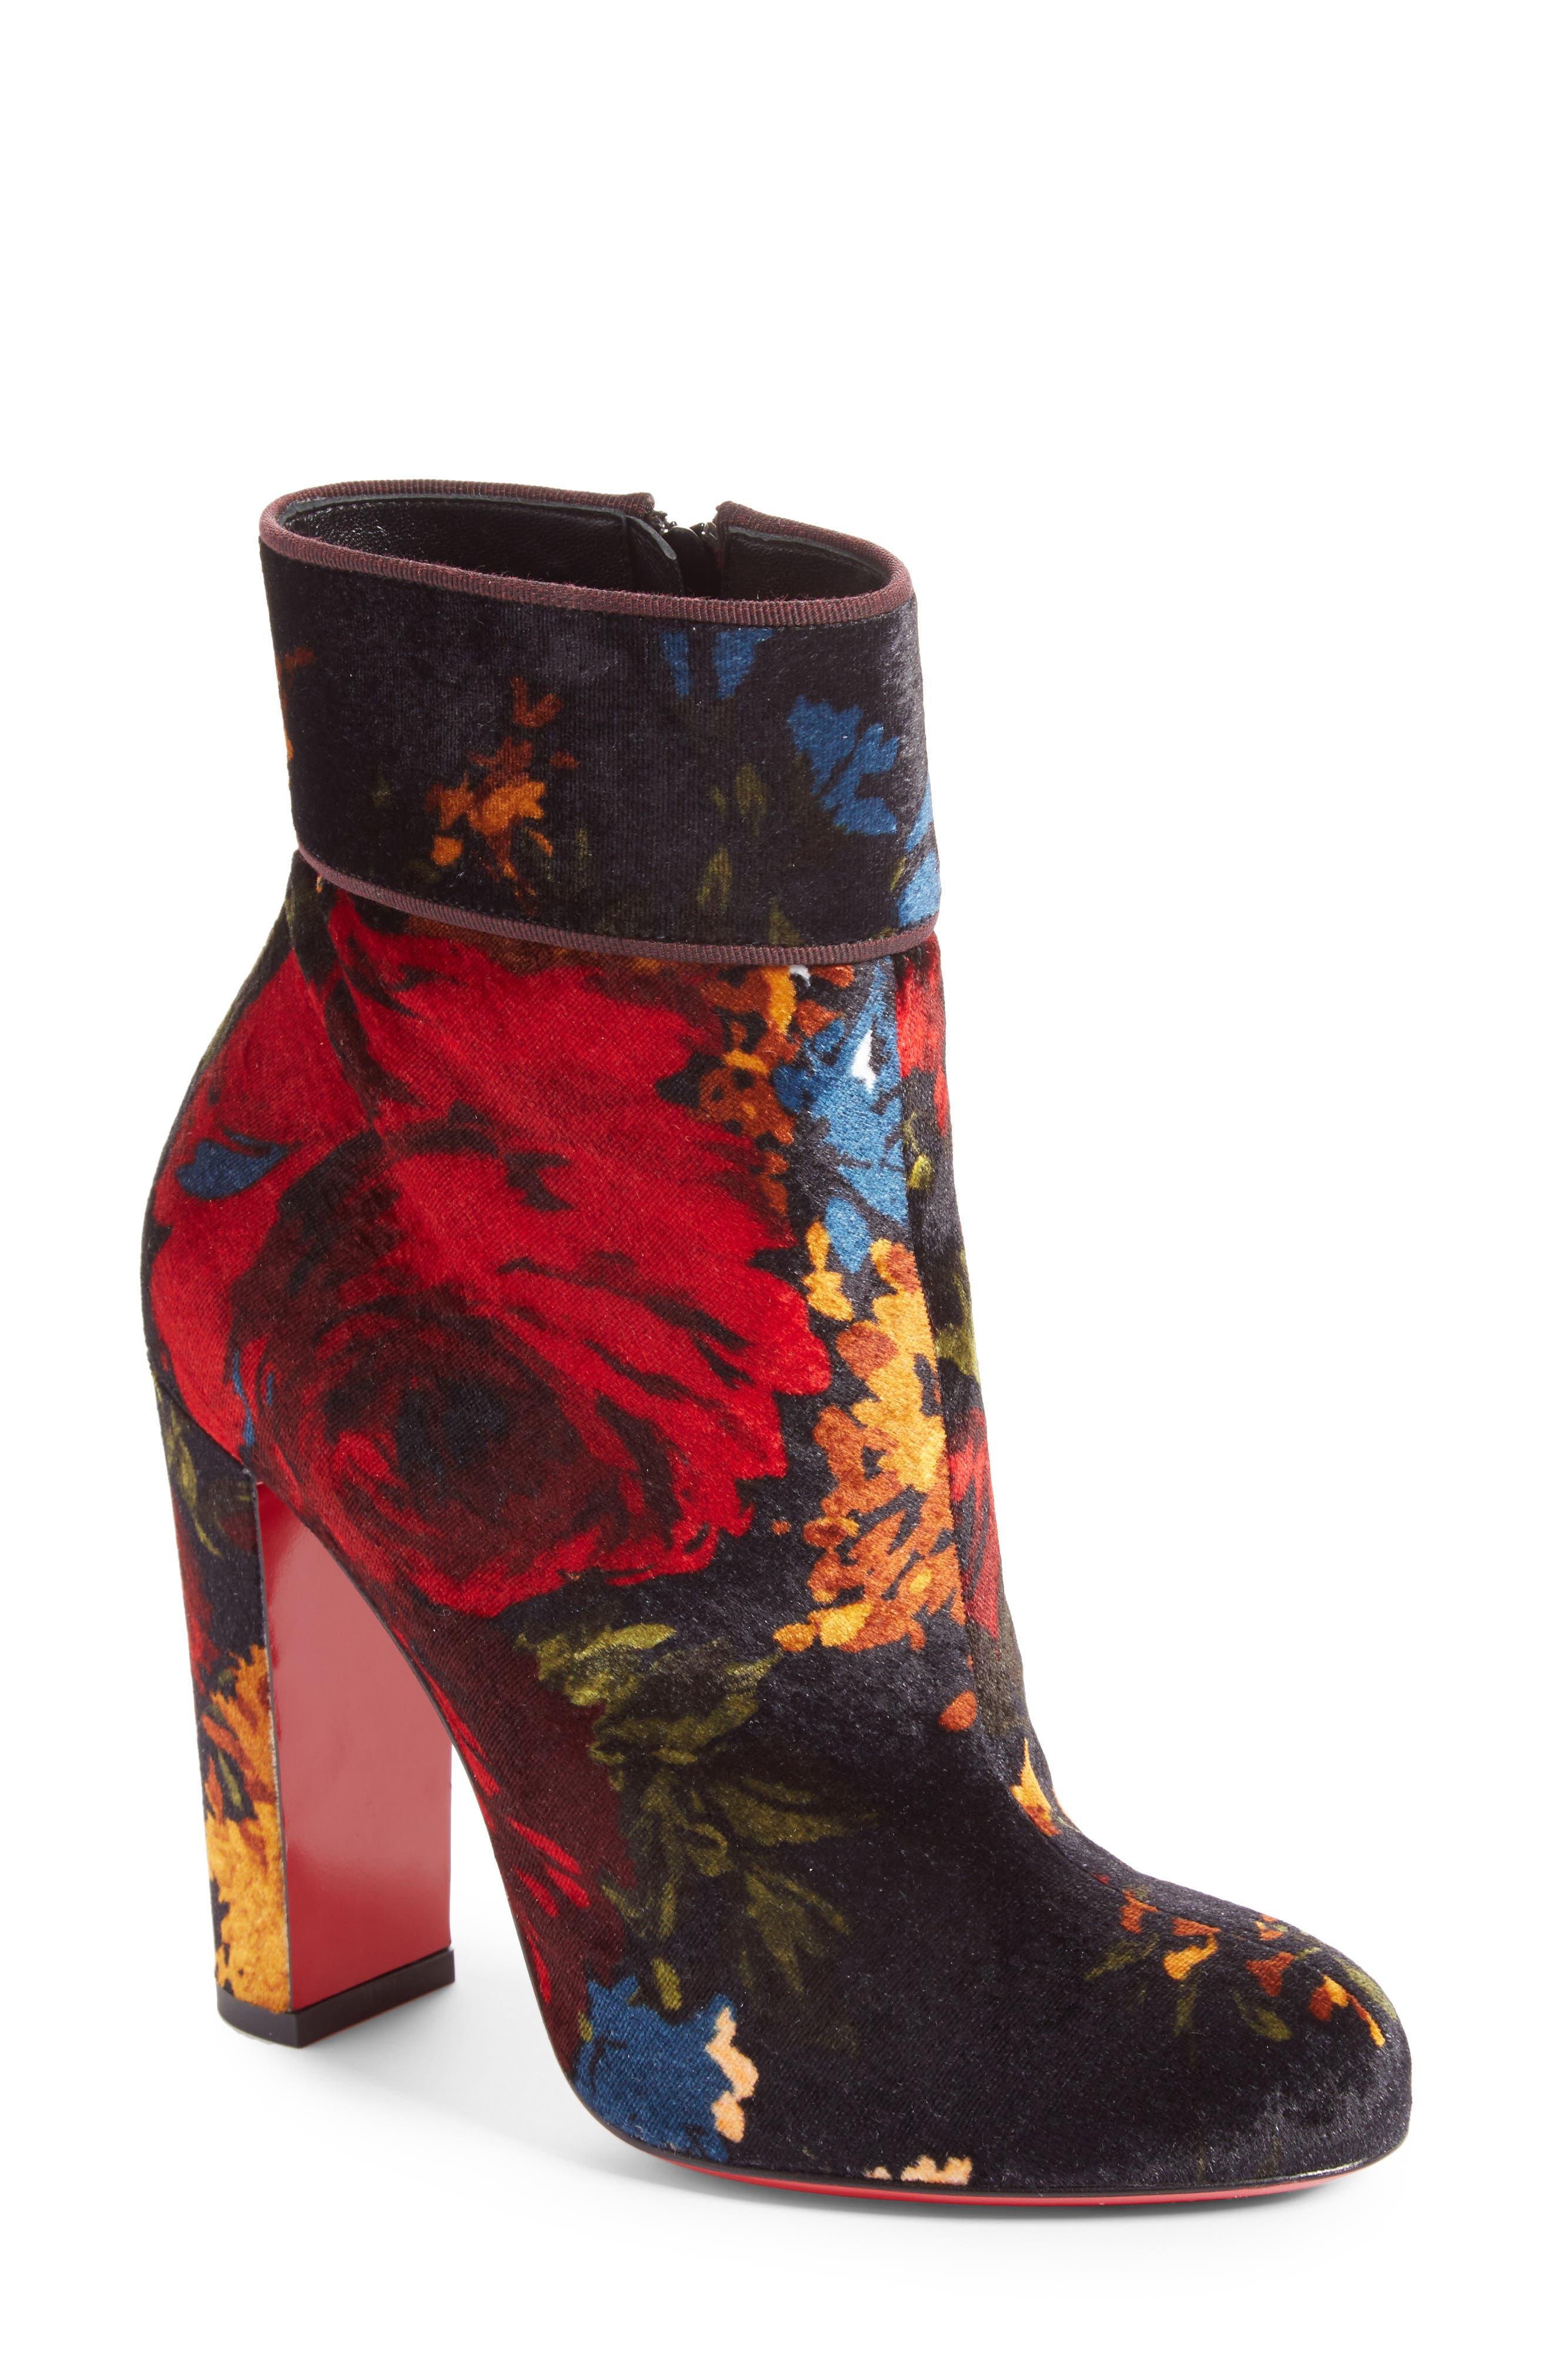 Moulamax Floral Velvet Bootie,                         Main,                         color, Black Floral Velvet